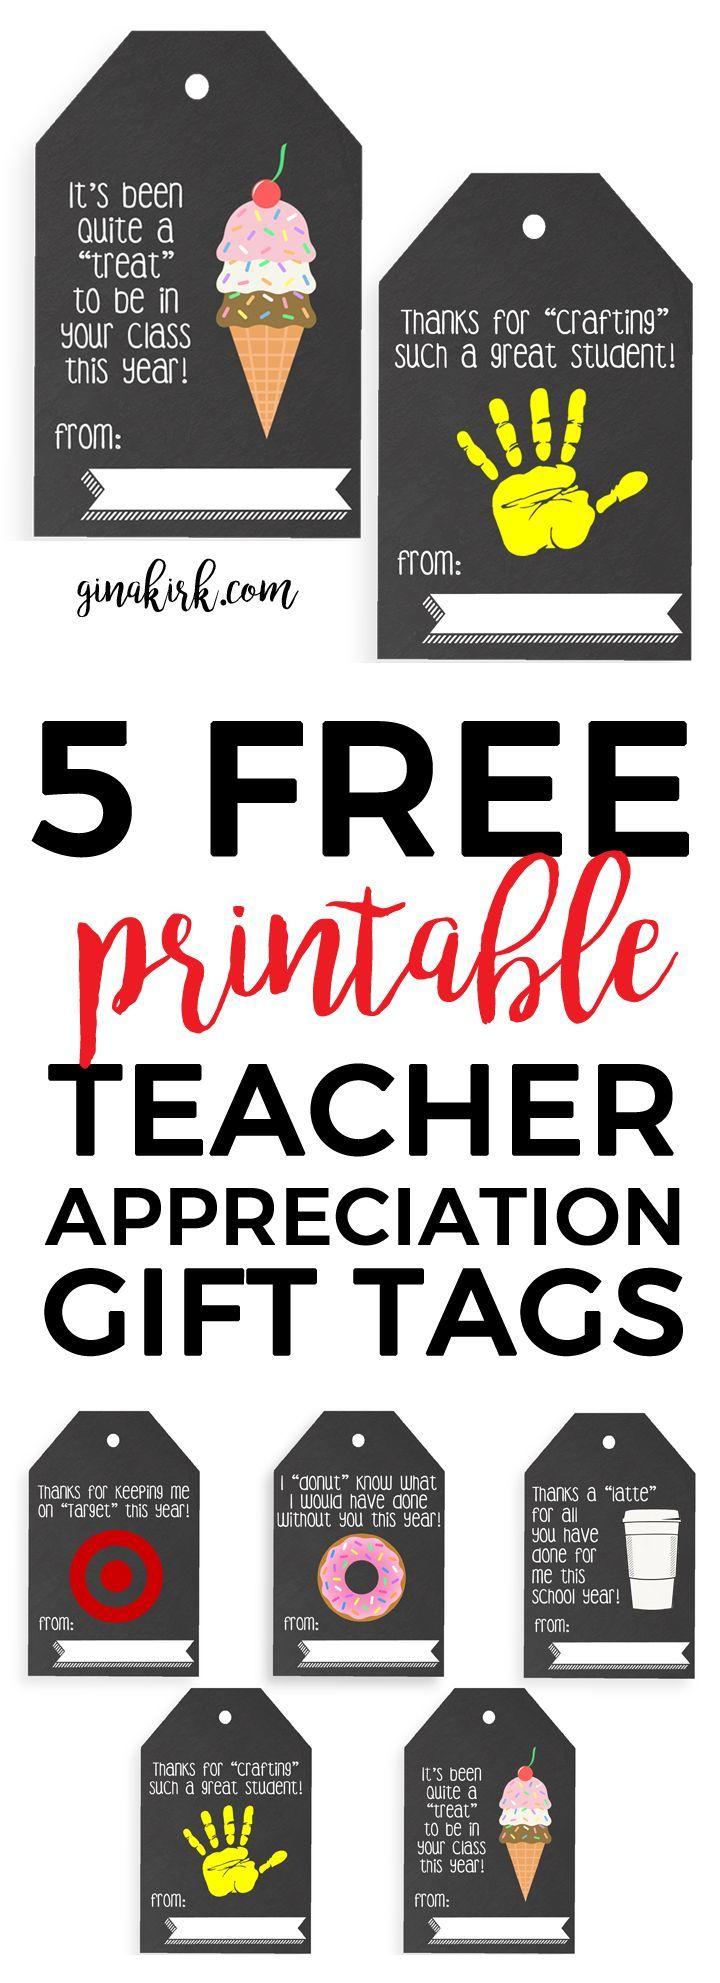 Teacher appreciation gift   DIY teacher gift idea   Printable tag for teacher crafts and gifts!   GinaKirk.com @Gina Kirk